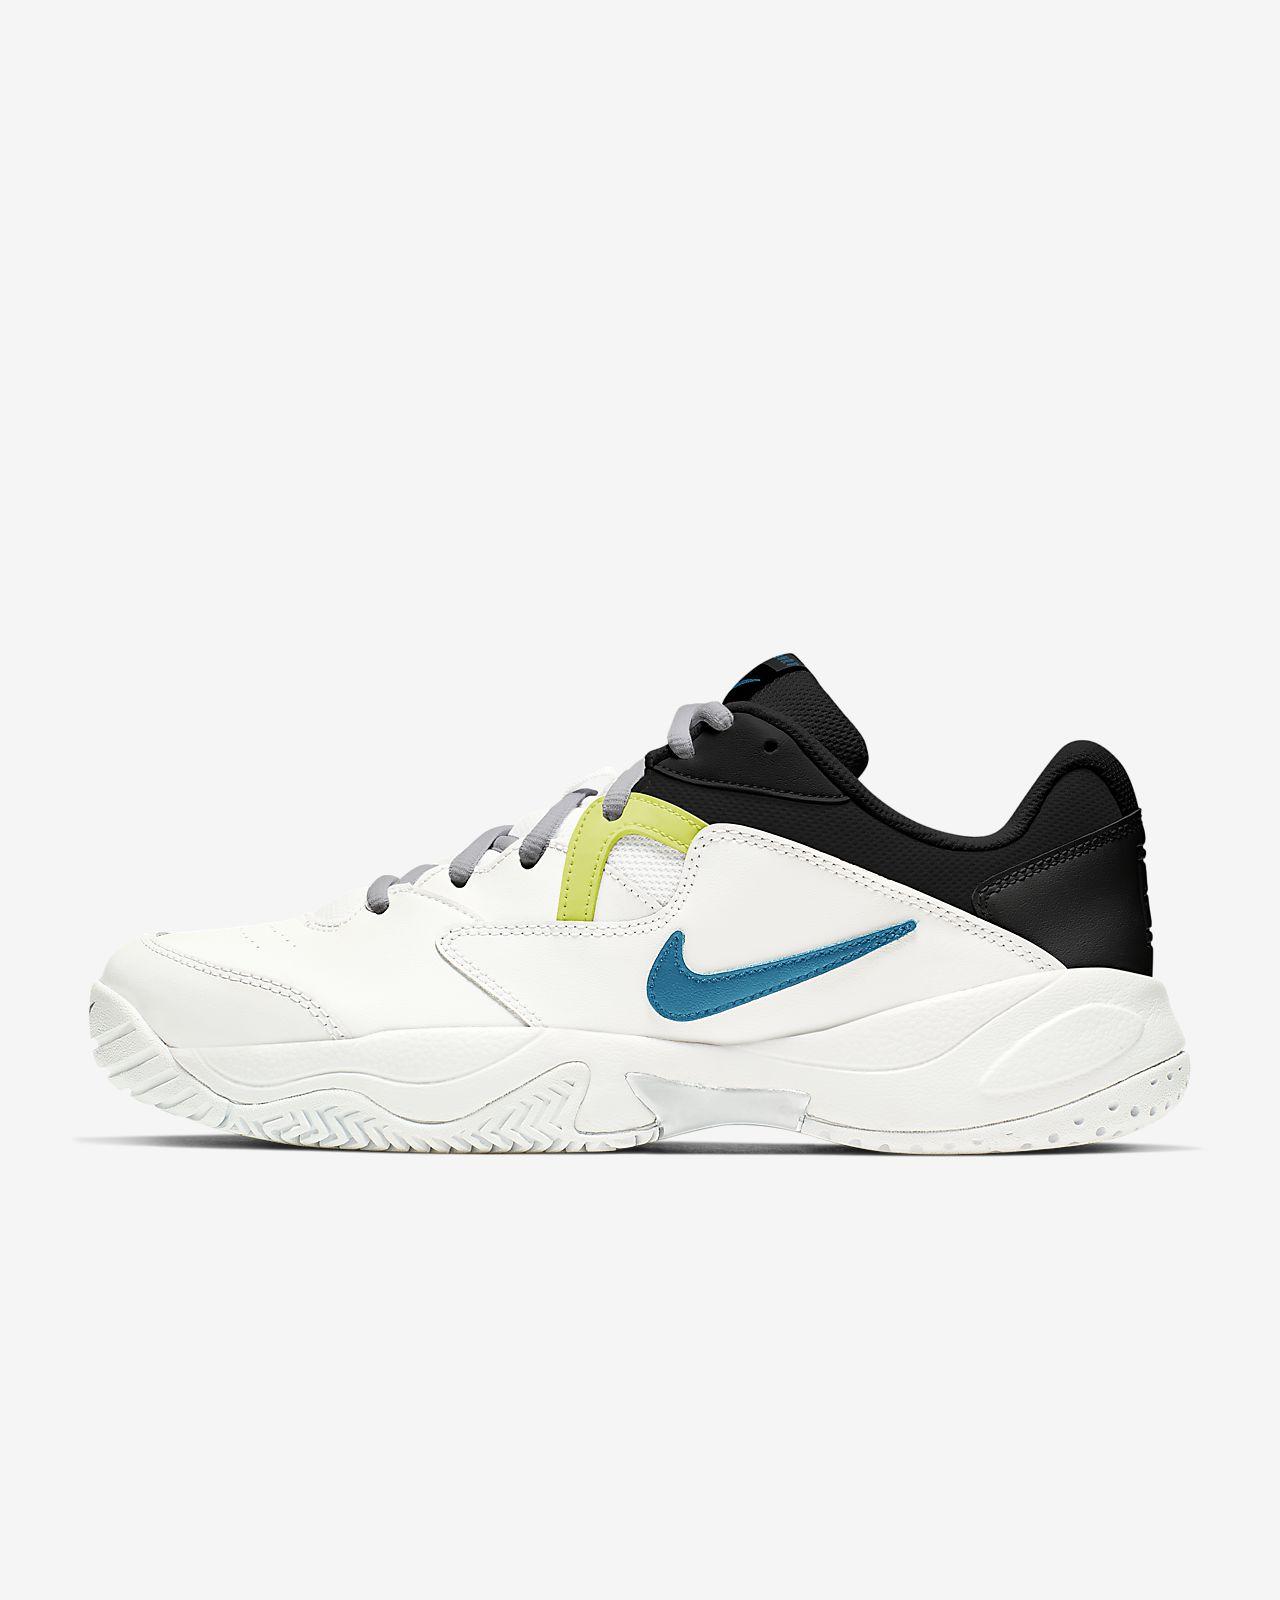 NikeCourt Lite 2 Men's Hard Court Tennis Shoe